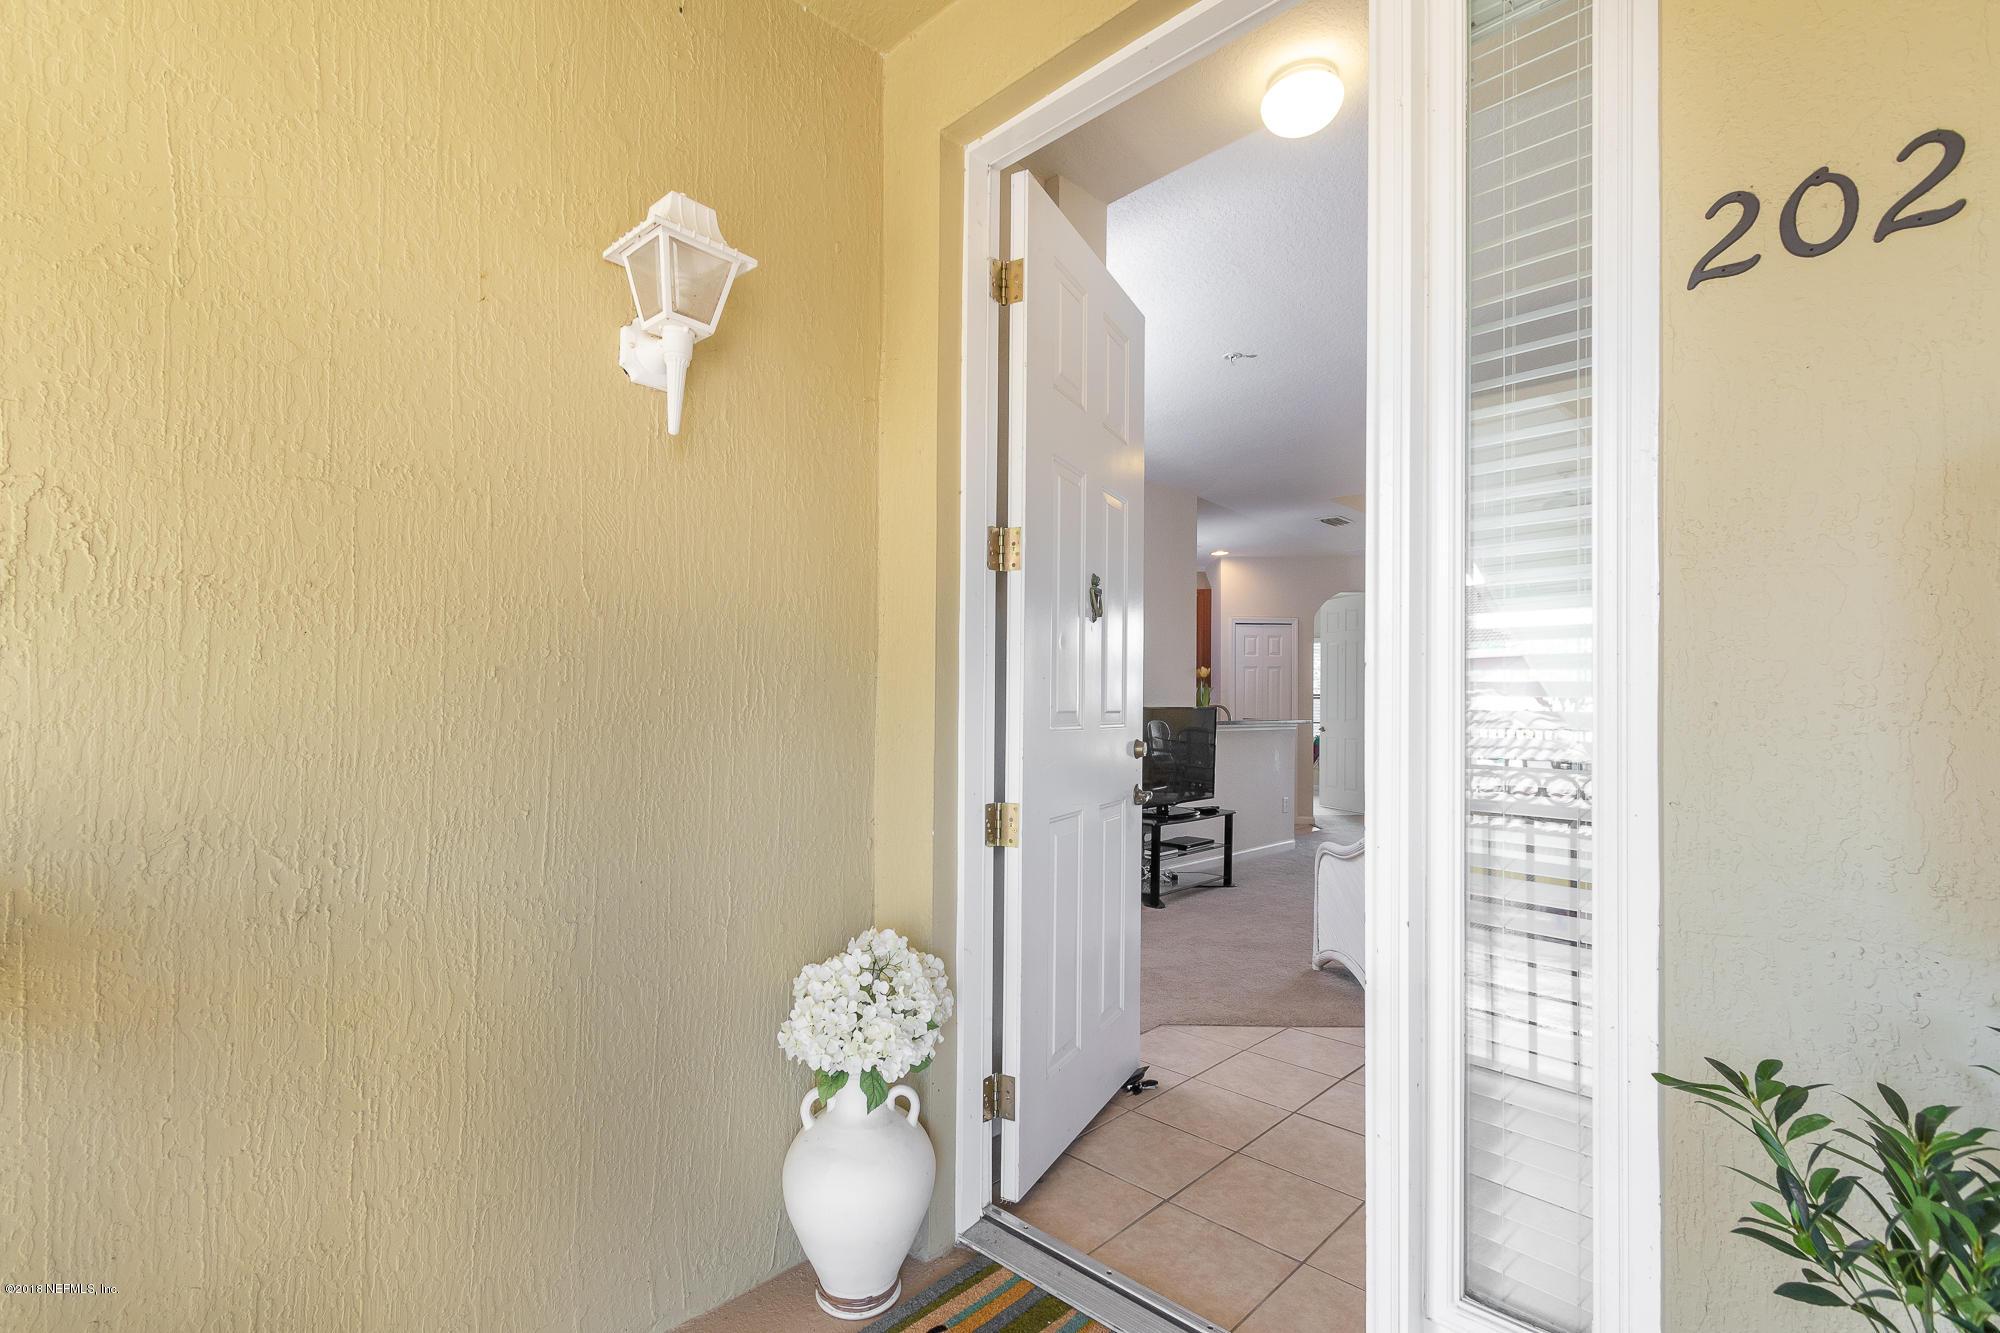 405 LA TRAVESIA FLORA, ST AUGUSTINE, FLORIDA 32095, 2 Bedrooms Bedrooms, ,2 BathroomsBathrooms,Residential - condos/townhomes,For sale,LA TRAVESIA FLORA,966345